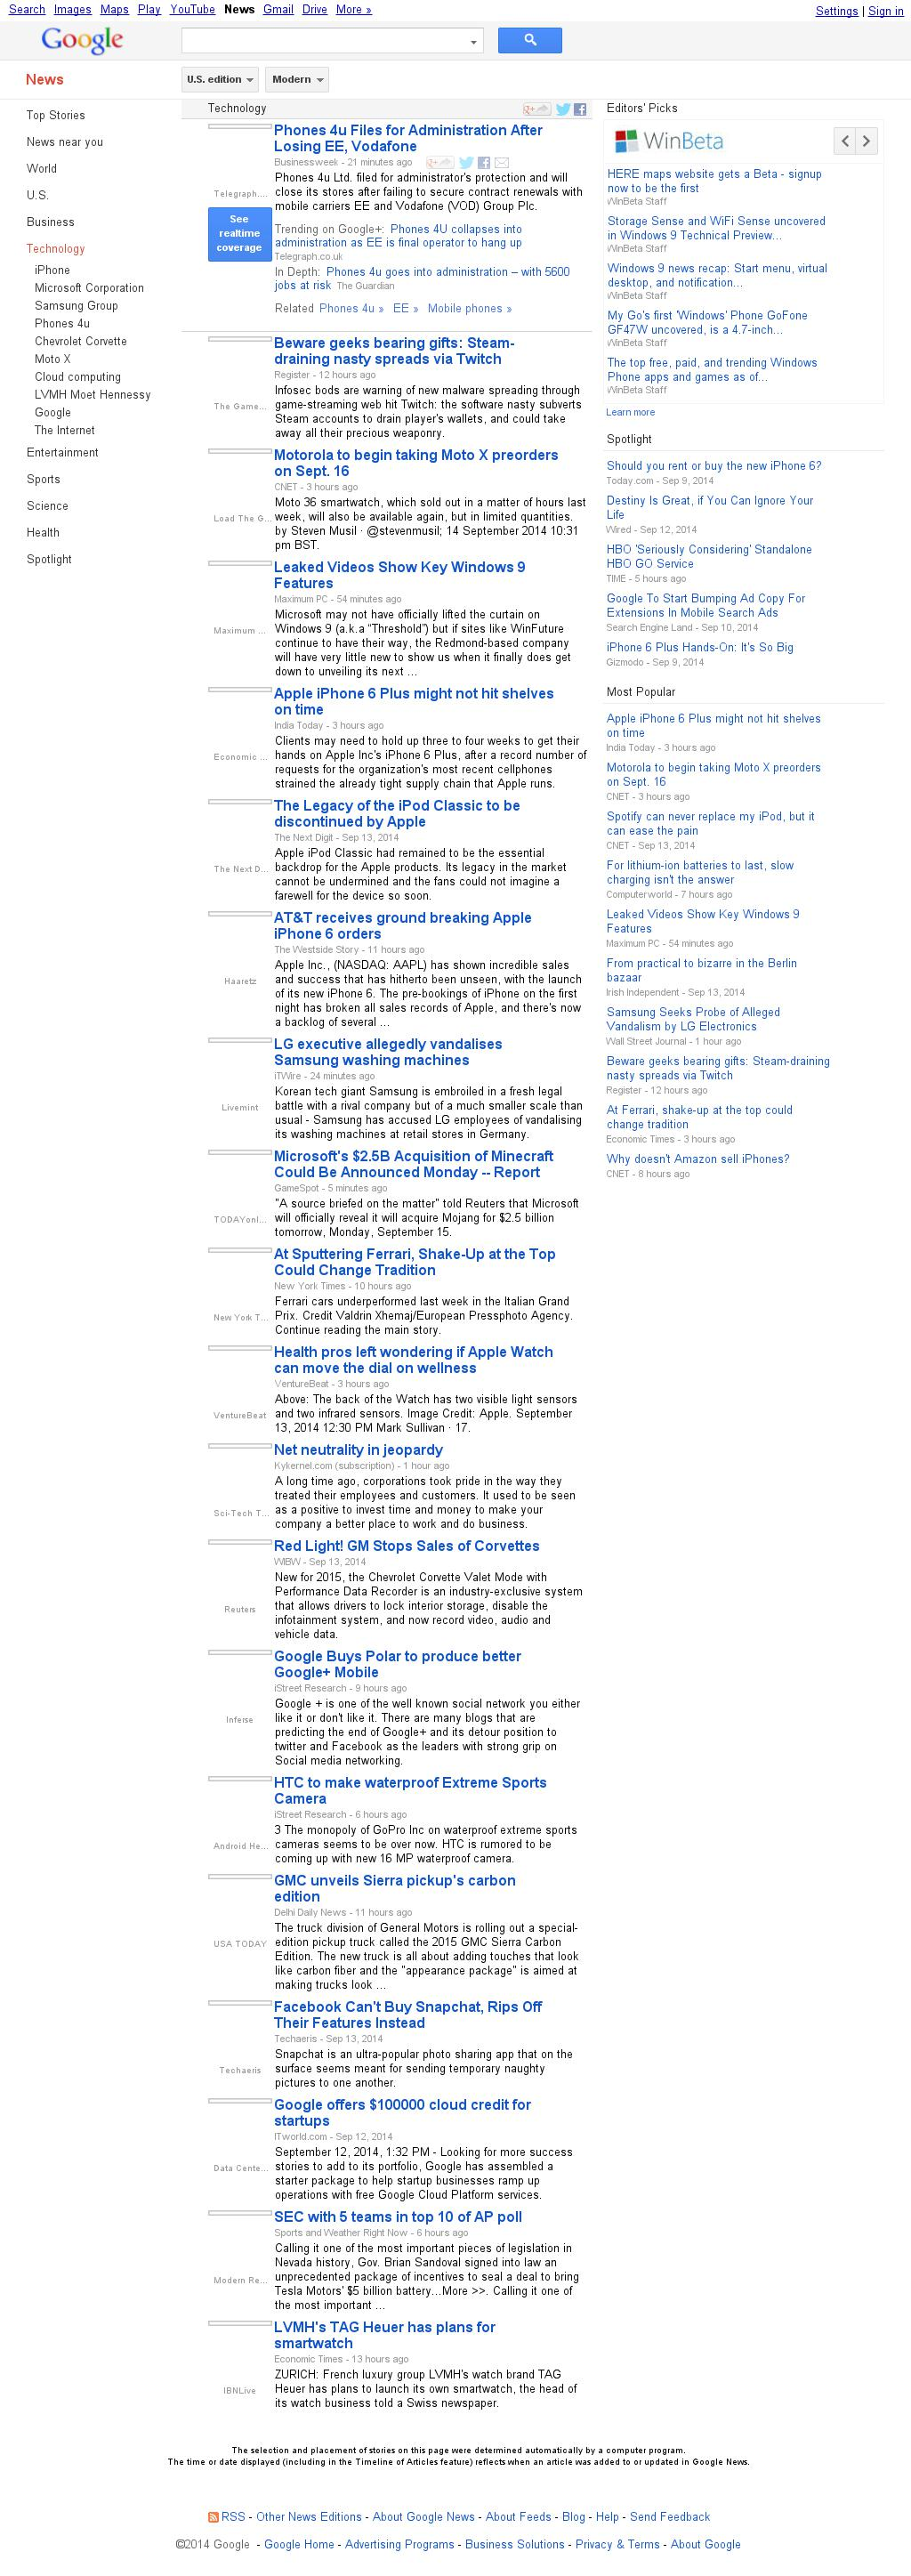 Google News: Technology at Monday Sept. 15, 2014, 1:08 a.m. UTC